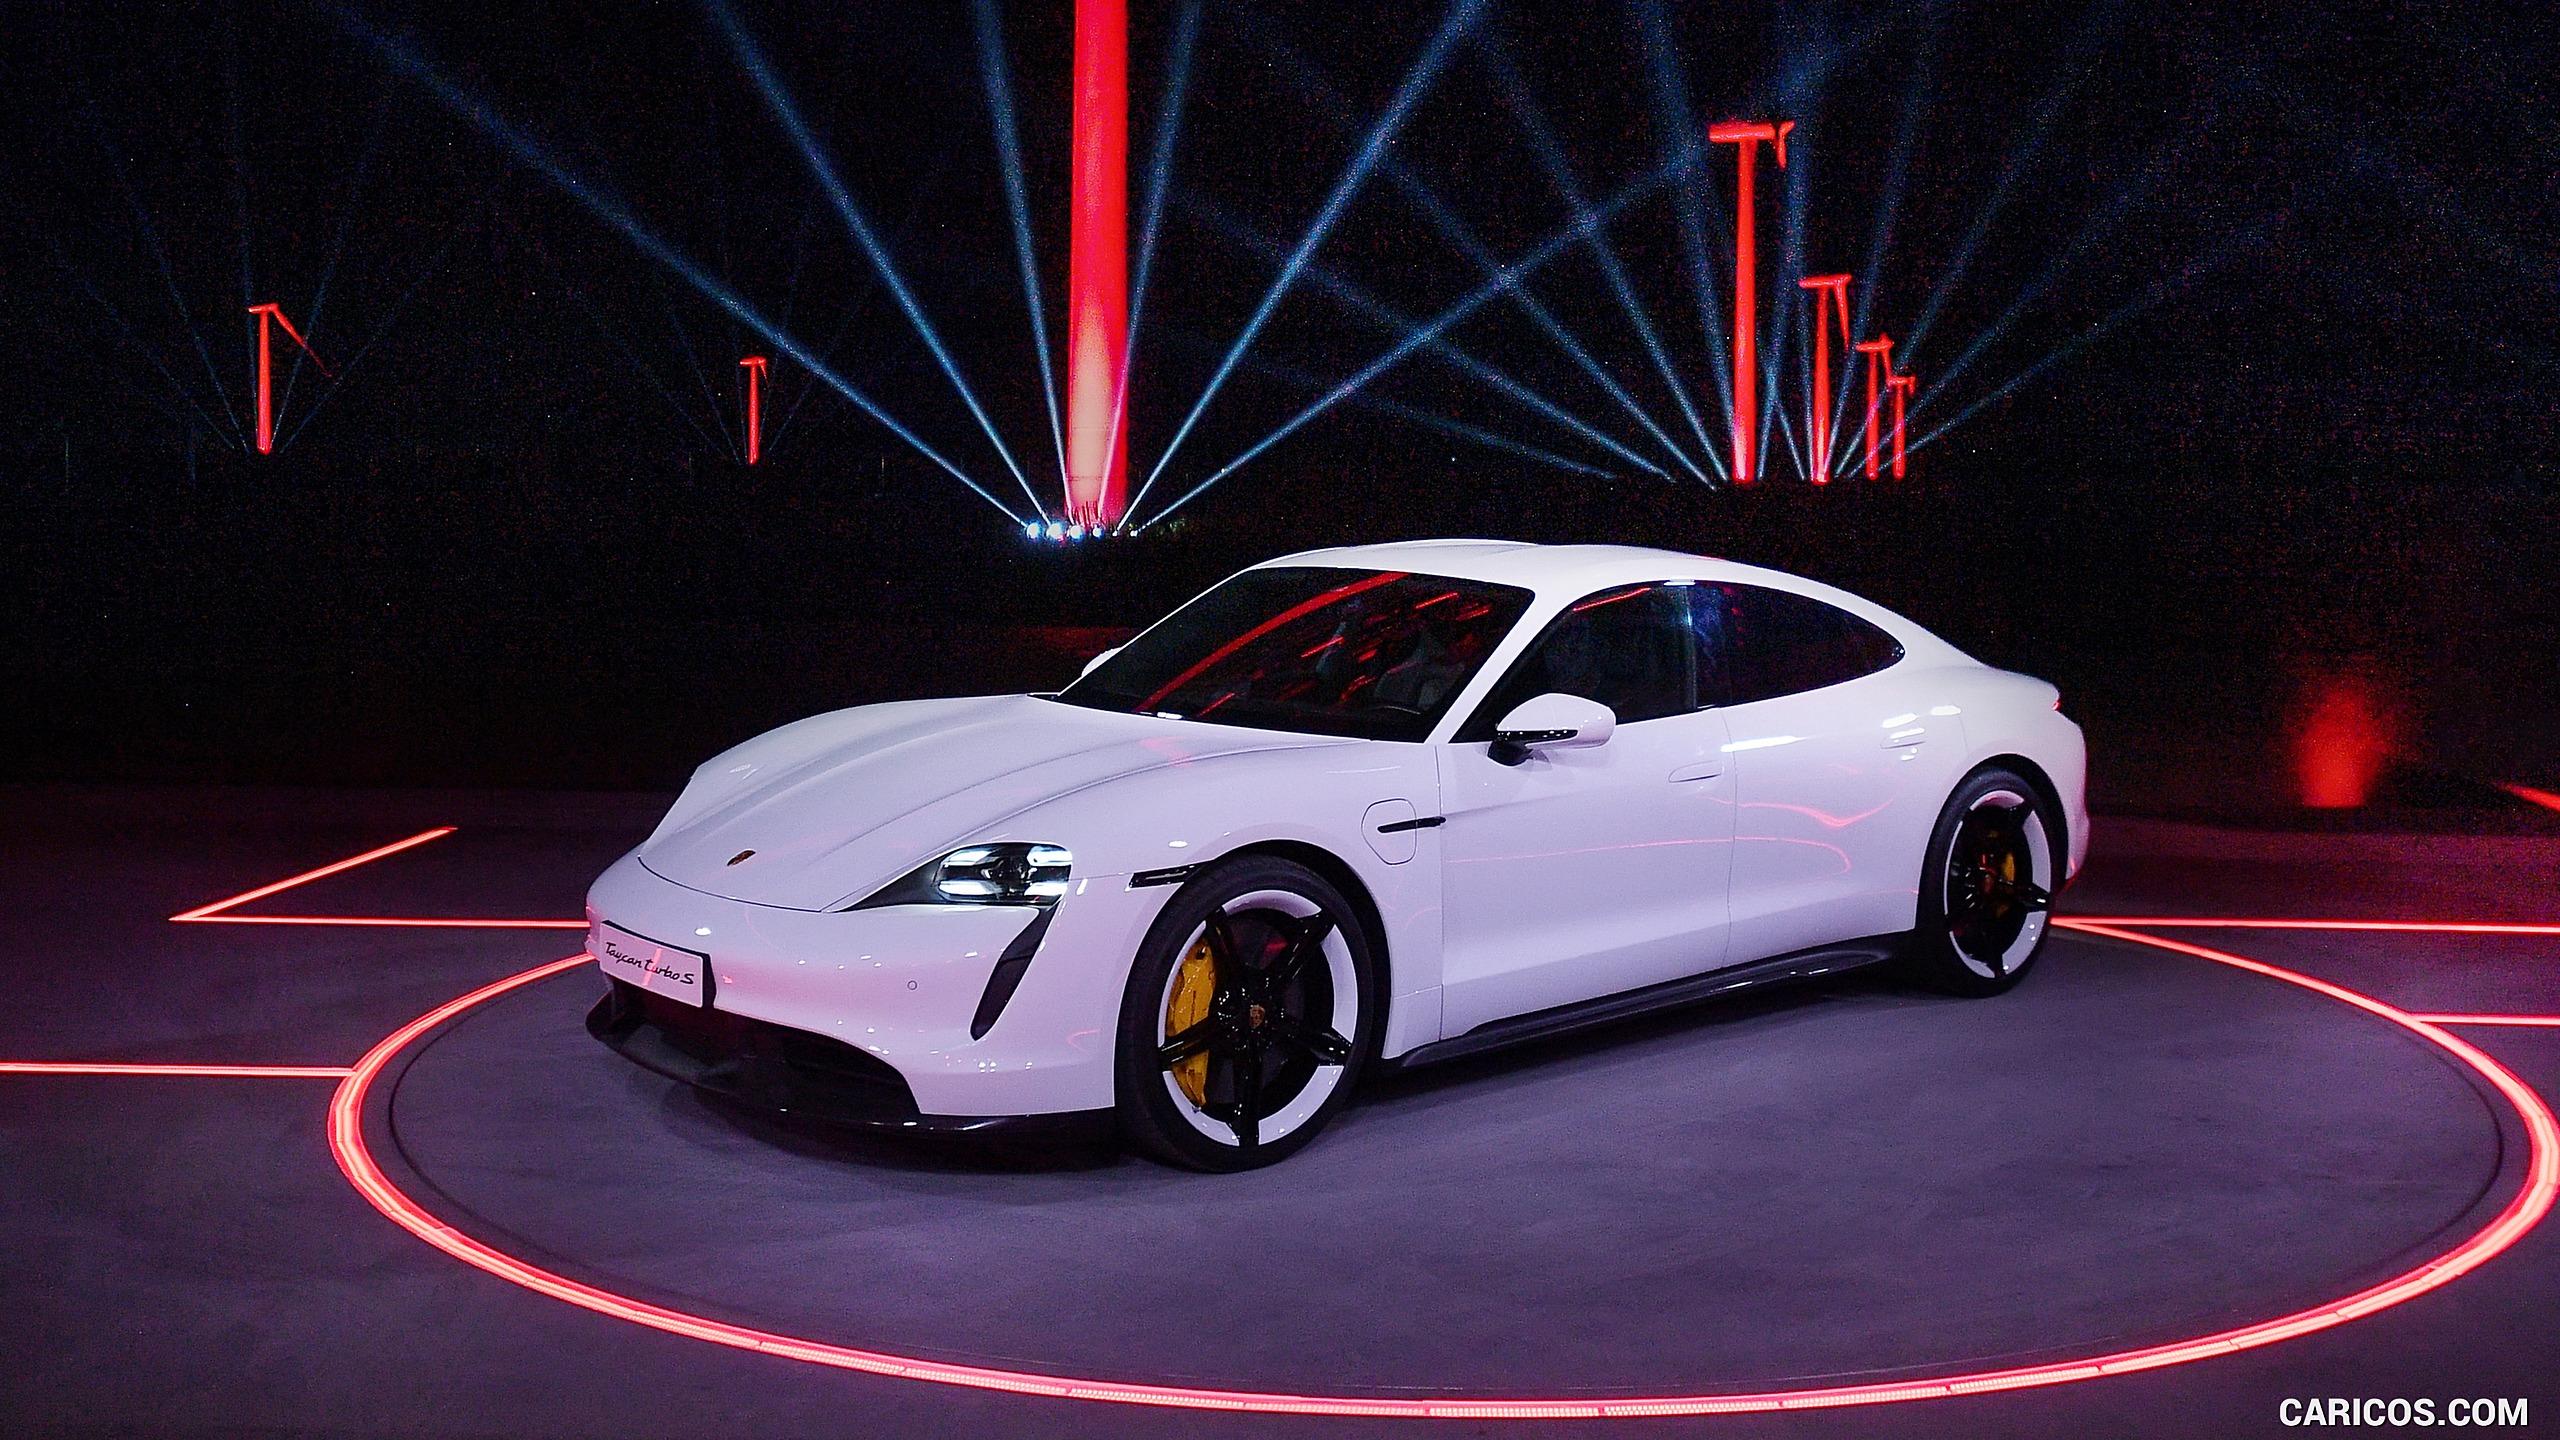 2020 Porsche Taycan Turbo S   Front Three Quarter HD Wallpaper 9 2560x1440